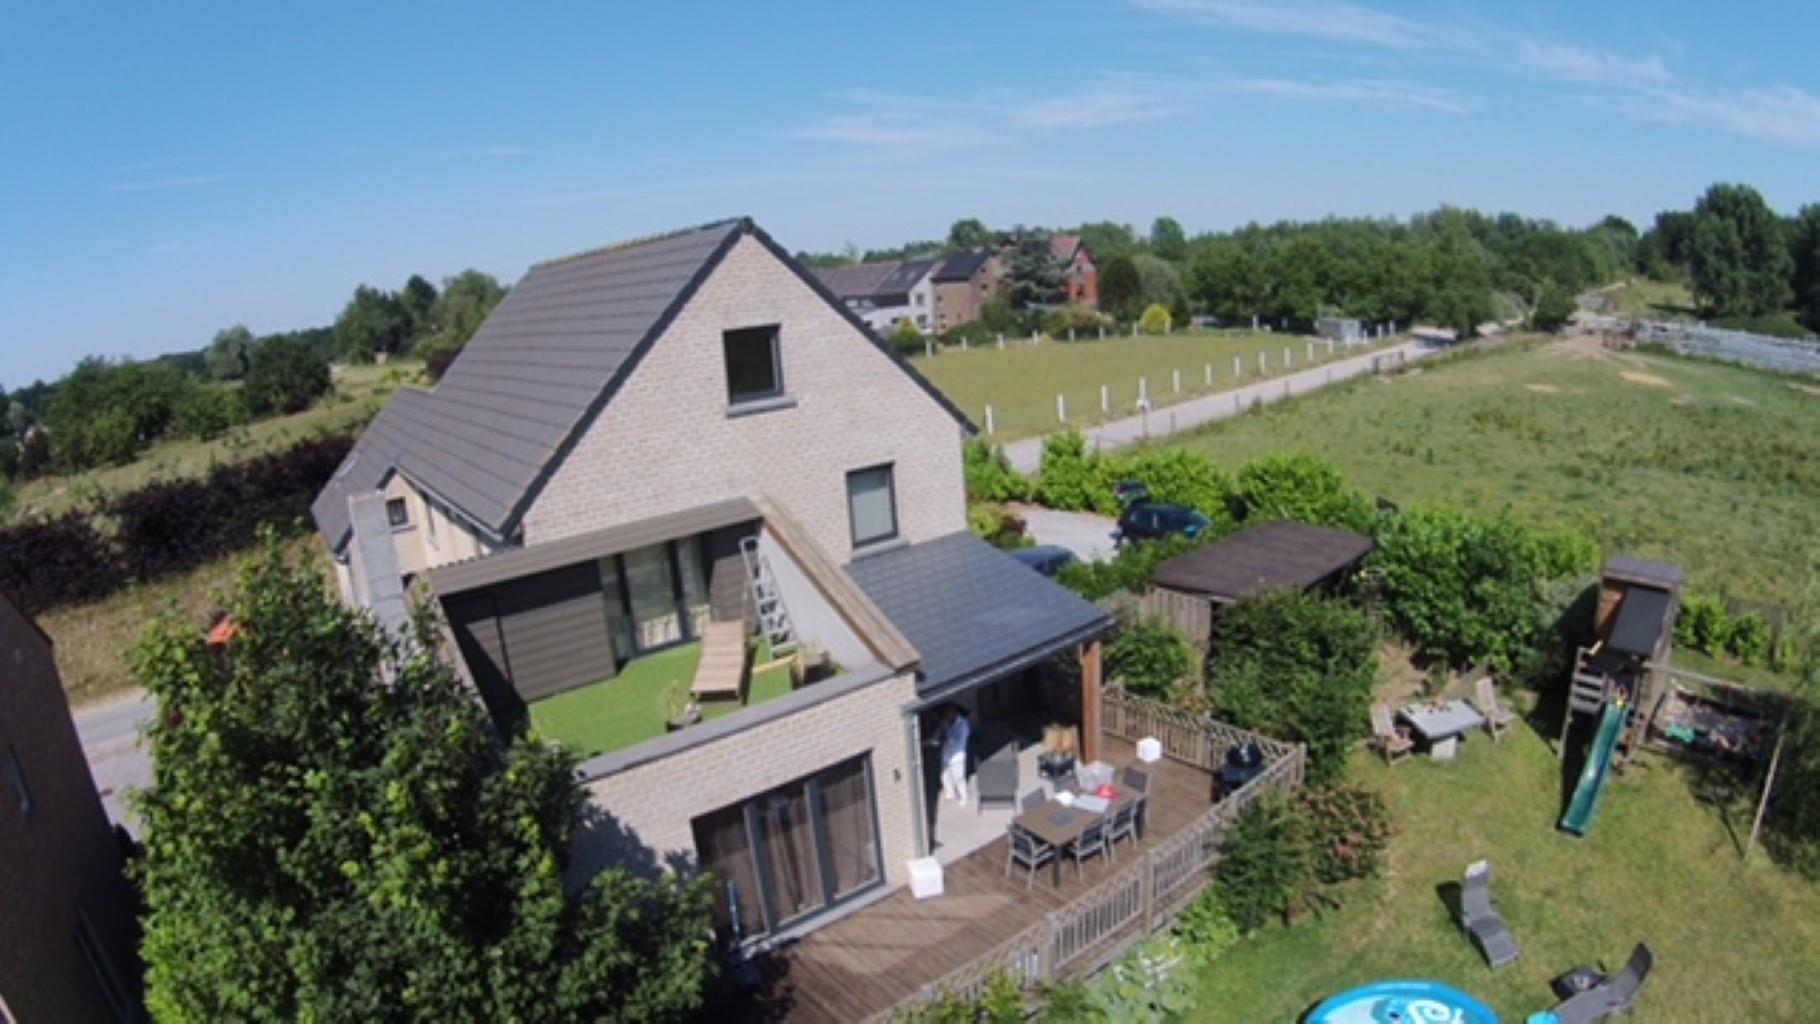 House - Villersla-Ville Tilly - #2038007-2